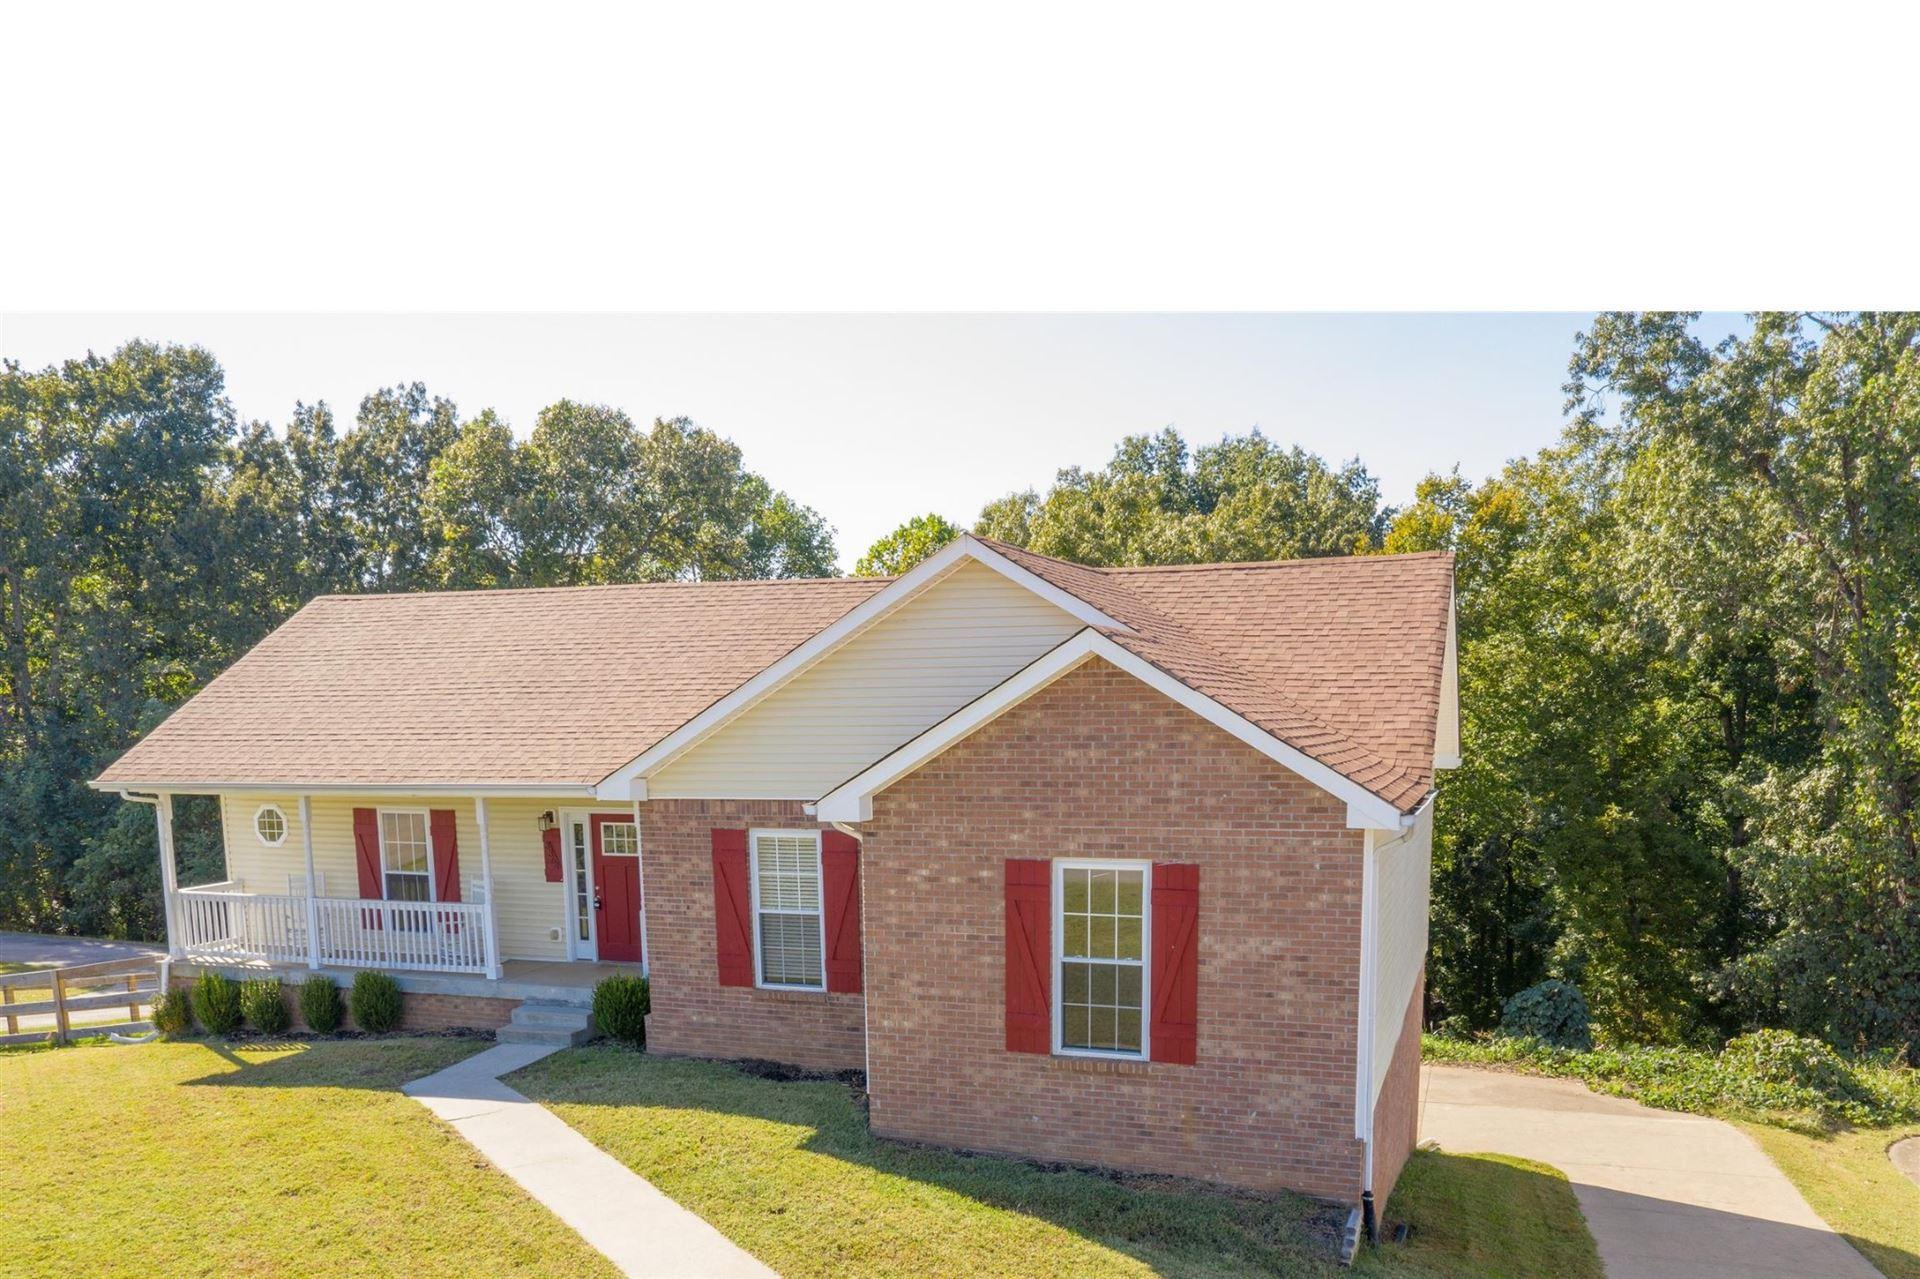 3364 N Henderson Way, Clarksville, TN 37042 - MLS#: 2261404